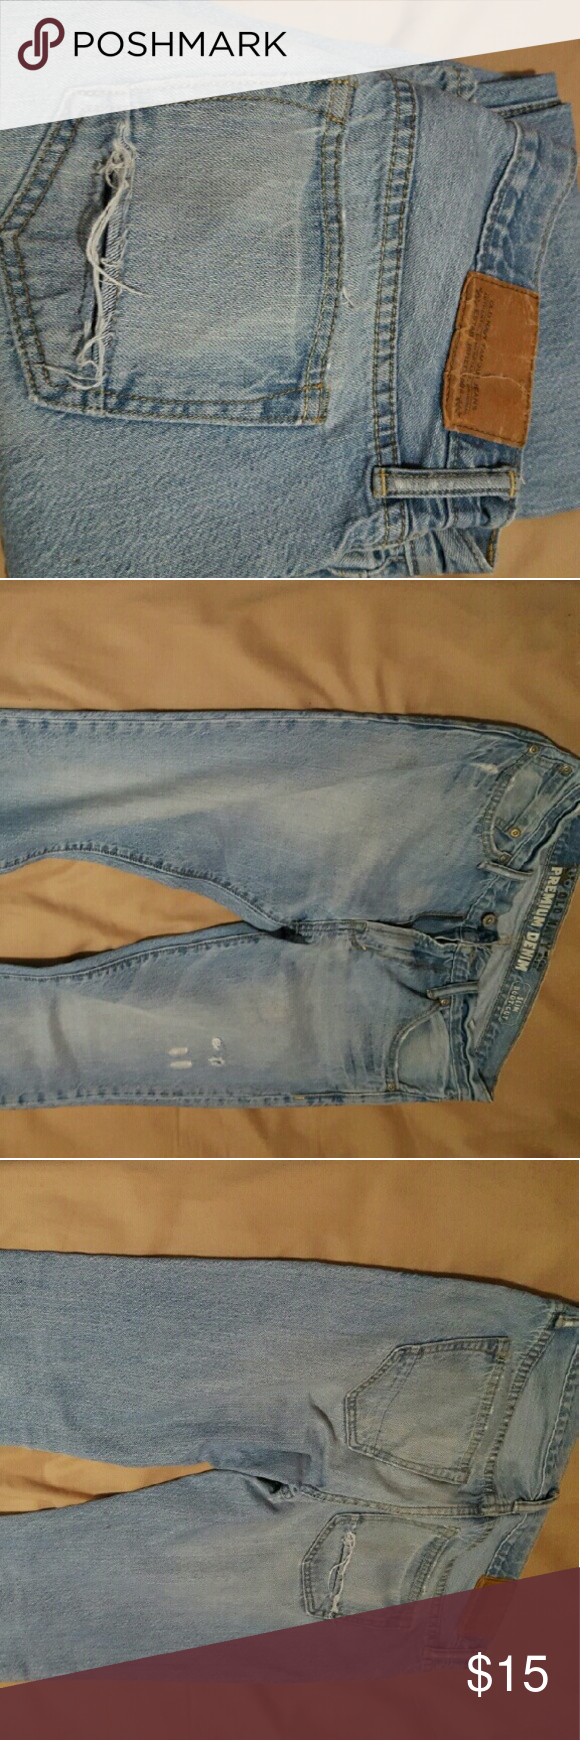 Mens old navy jeans Distressed designed jeans from old navy Old Navy Jeans Slim Straight